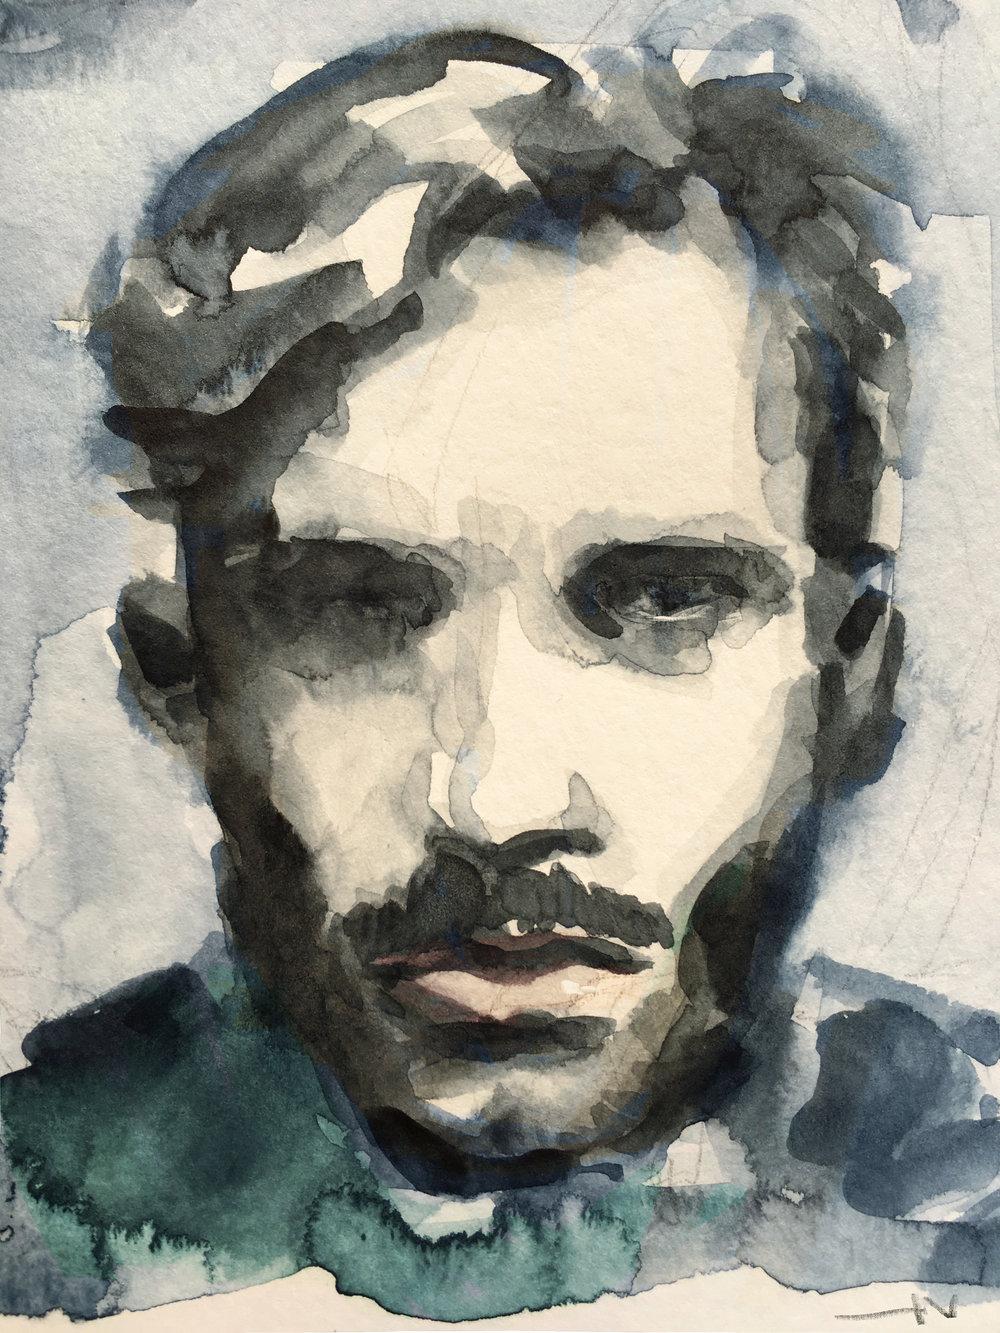 Self-portrait (2017) Tools: watercolors.